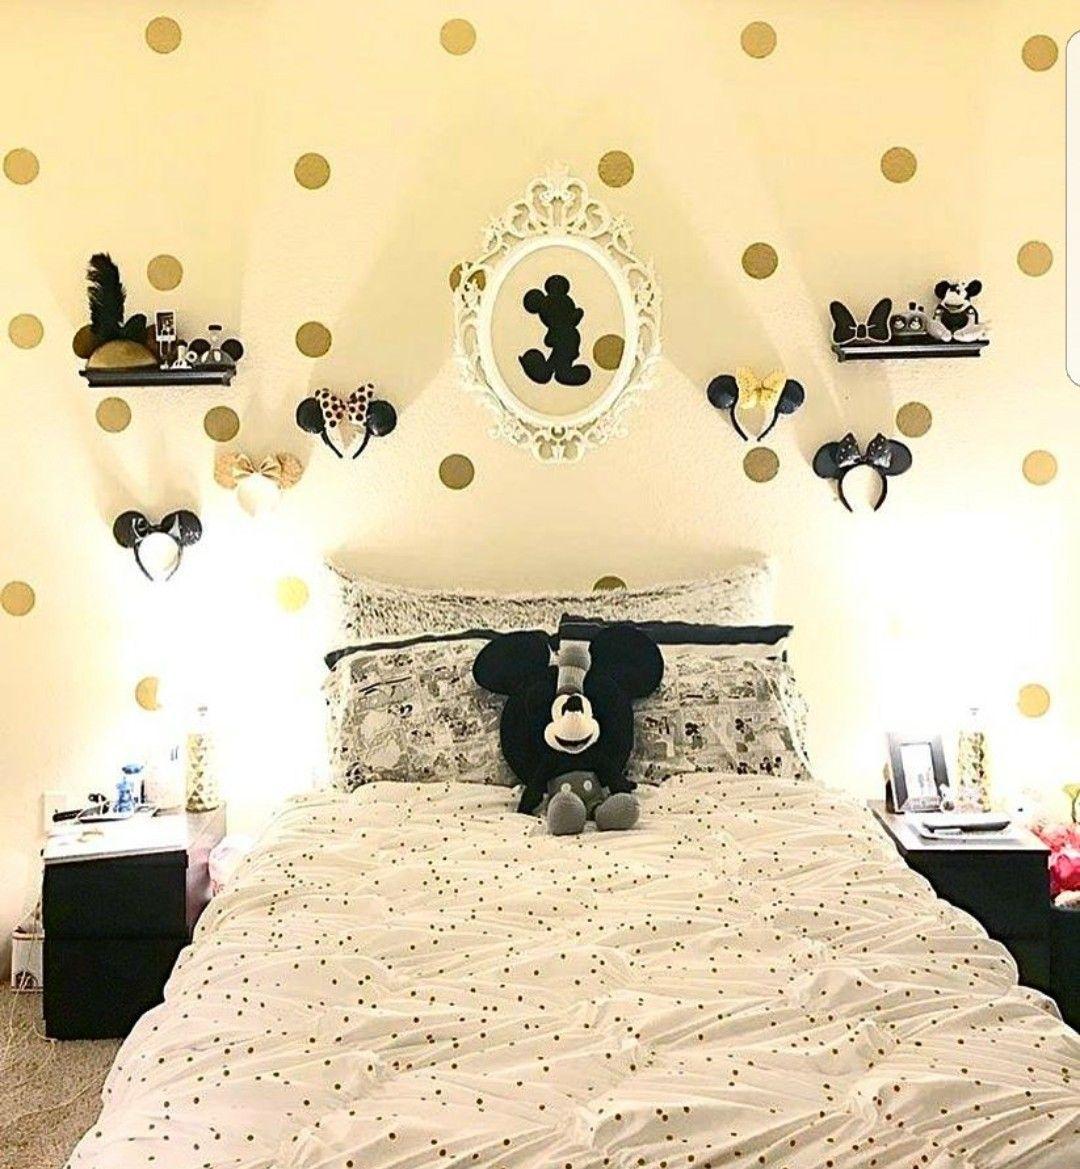 Disney home decor idea | Disney | Disney bedrooms, Disney home decor ...